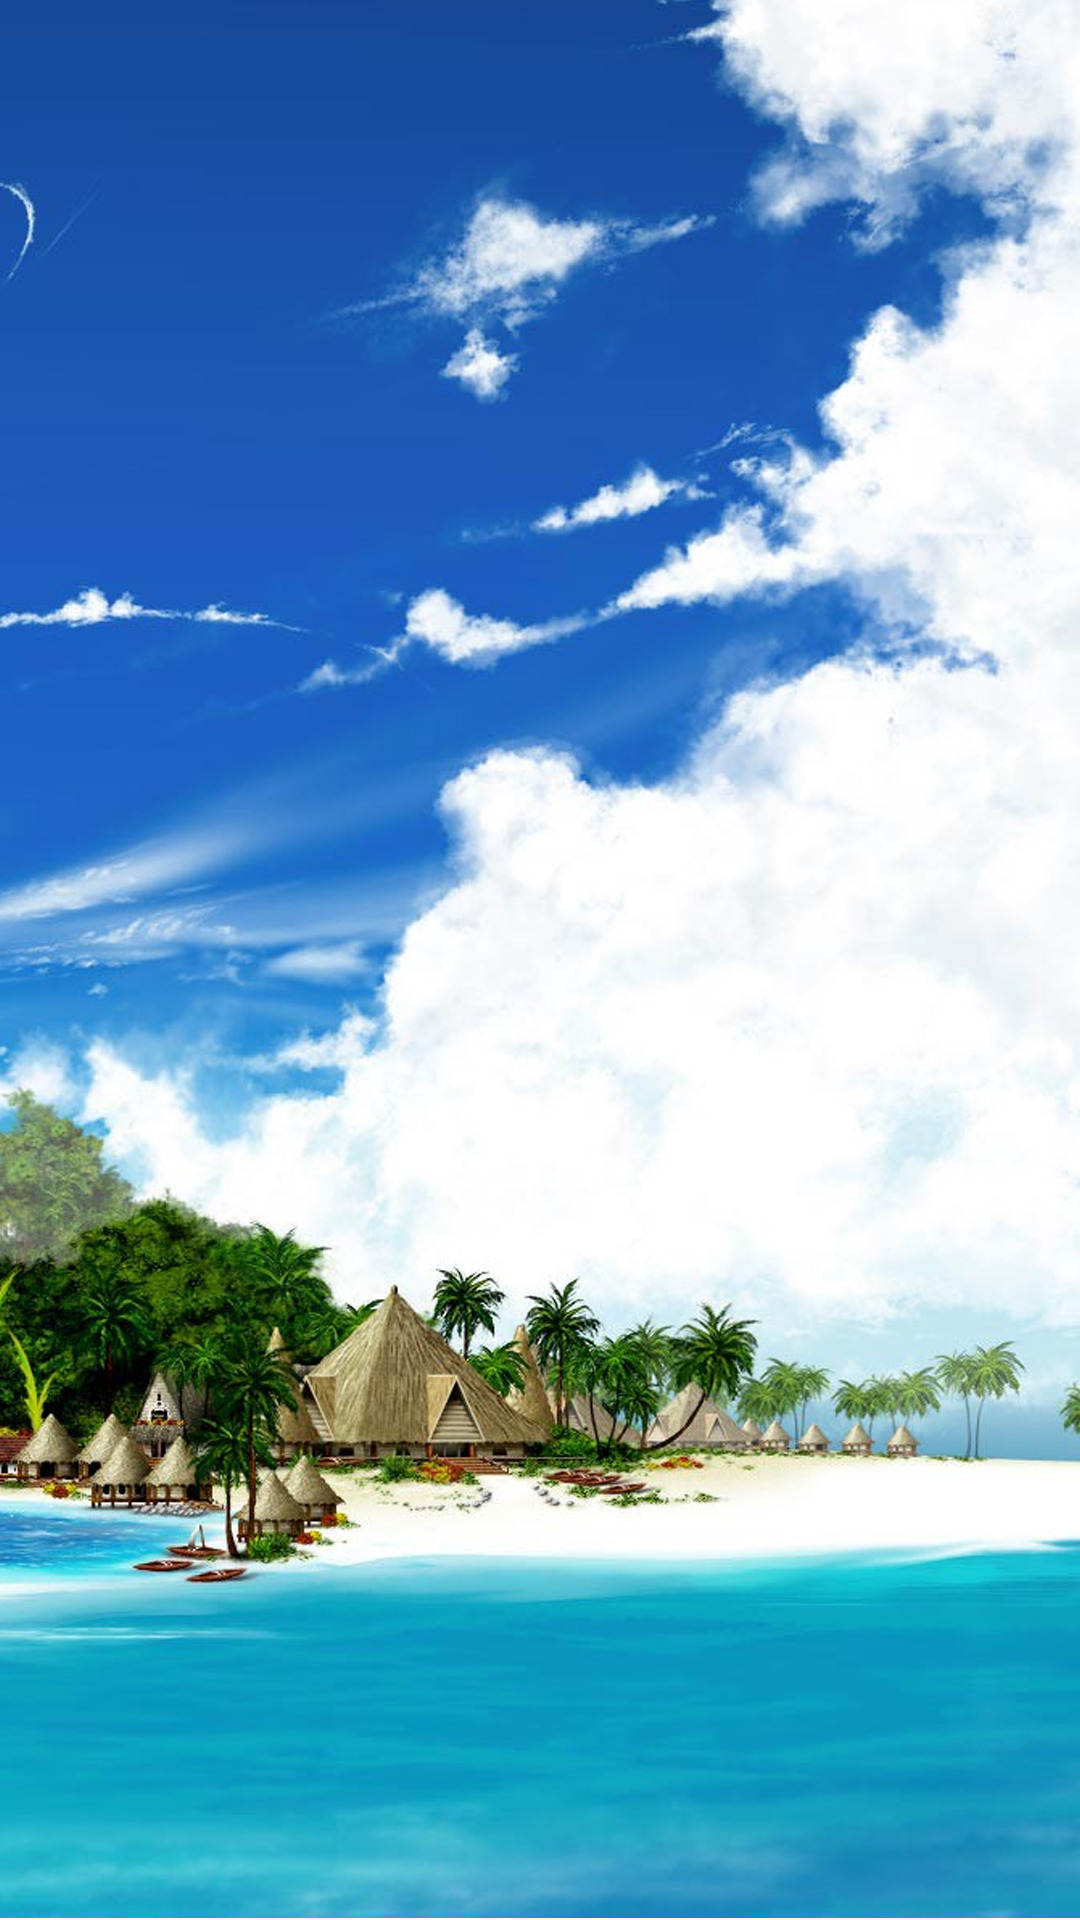 Beach resort beach